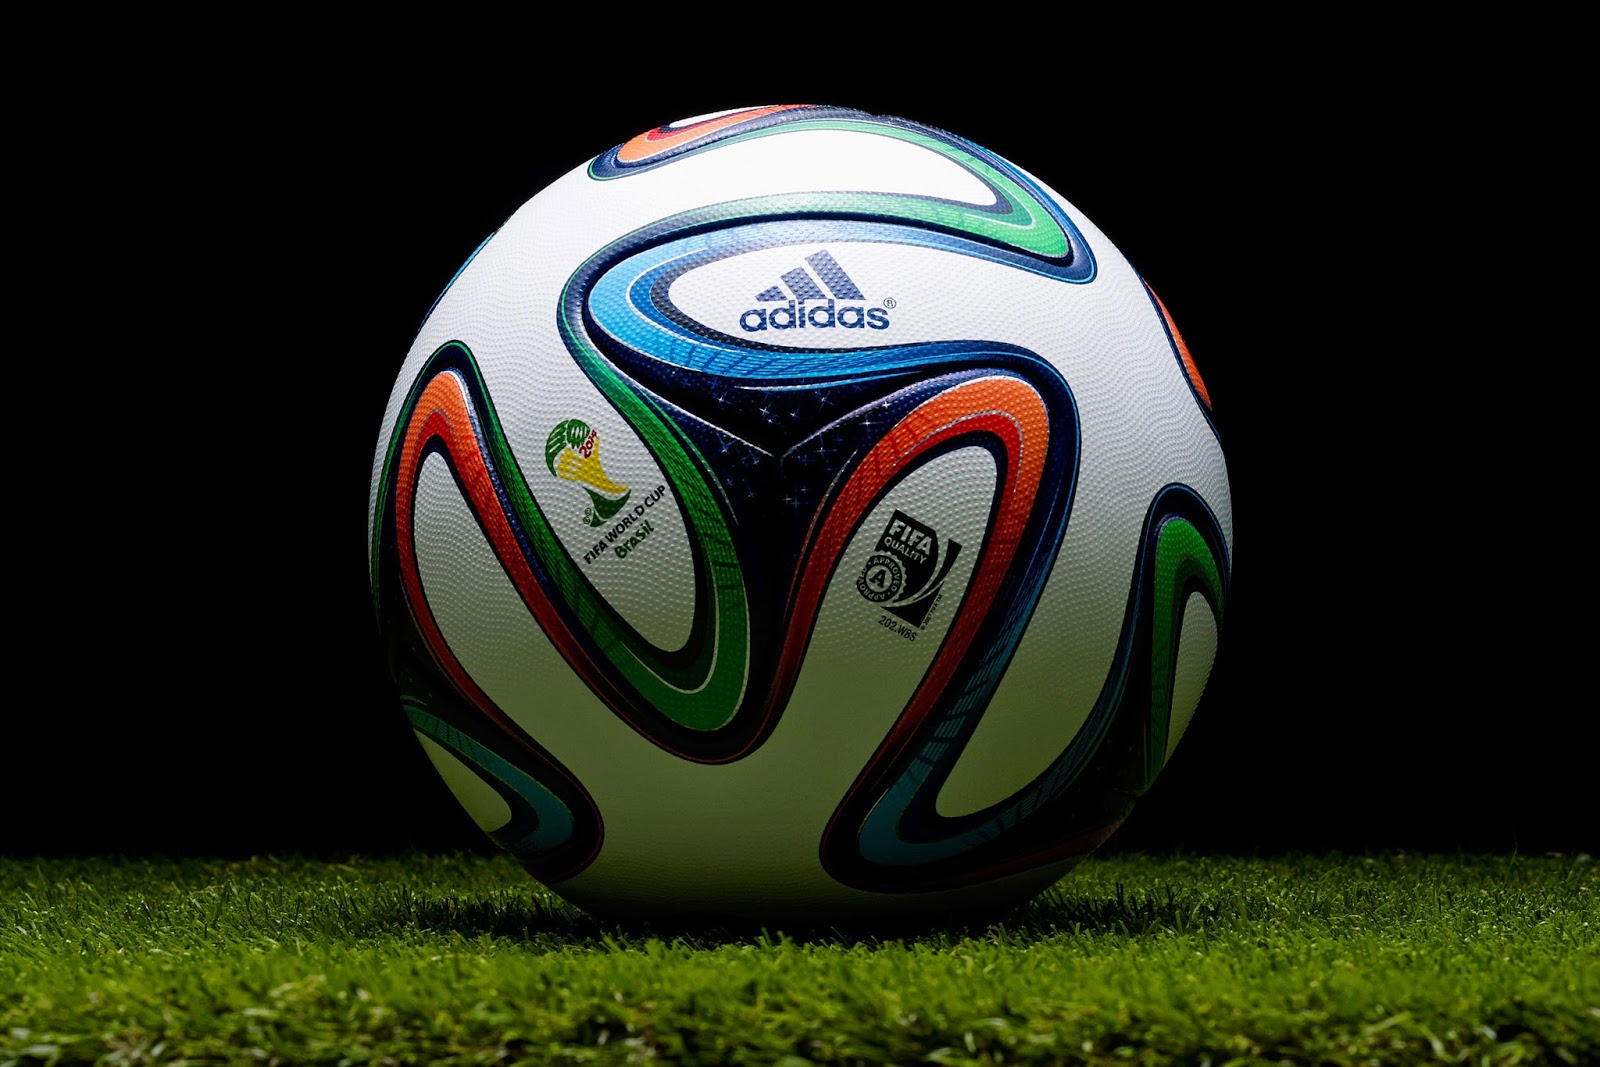 Brazuca football made in pakistan best wallpapers hd - Adidas football hd wallpapers ...